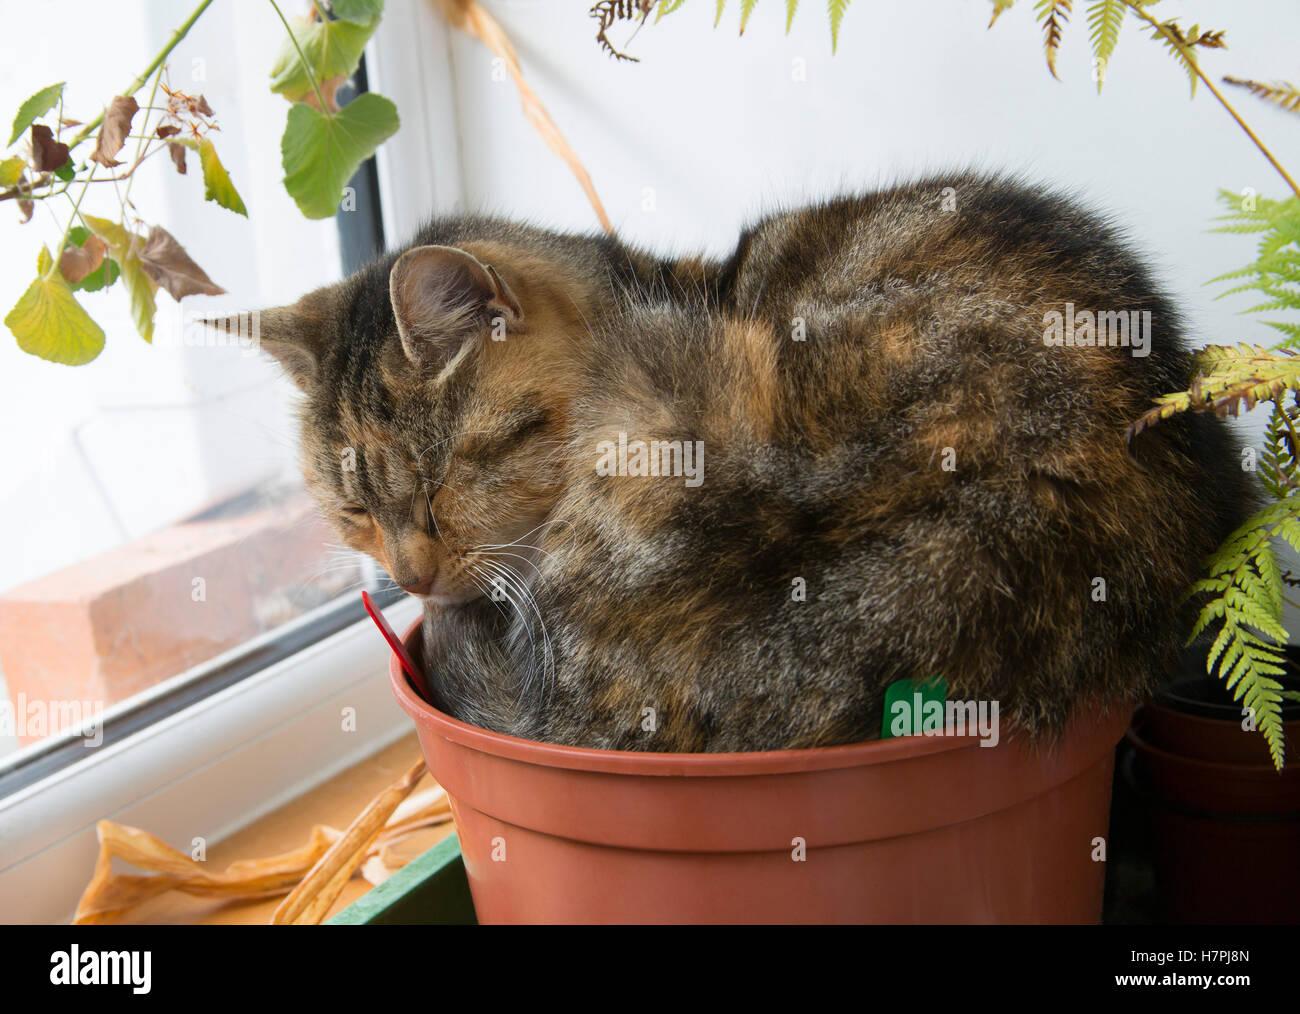 Domestic Cat, portrait of single adult sleeping in flowerpot. Worcestershire, UK. - Stock Image